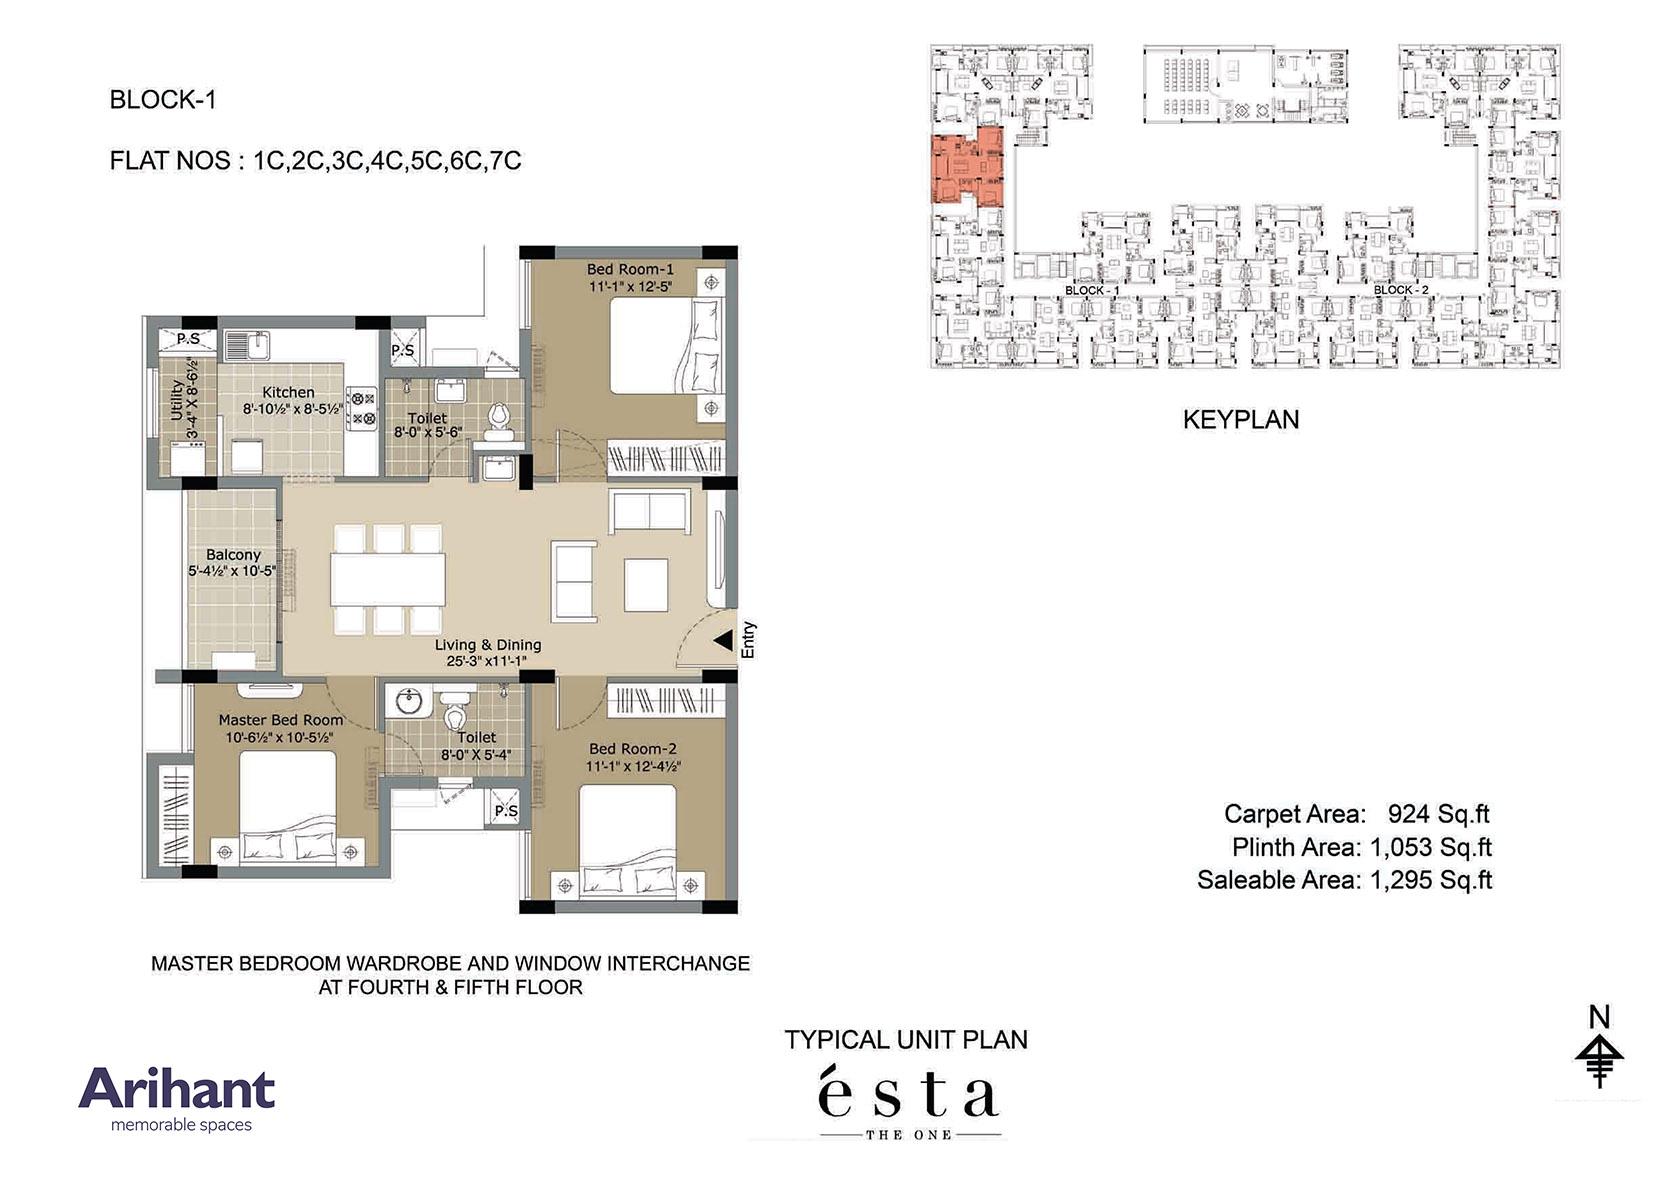 Arihant - Esta_Typical Unit Plan - Block 1 - Type C